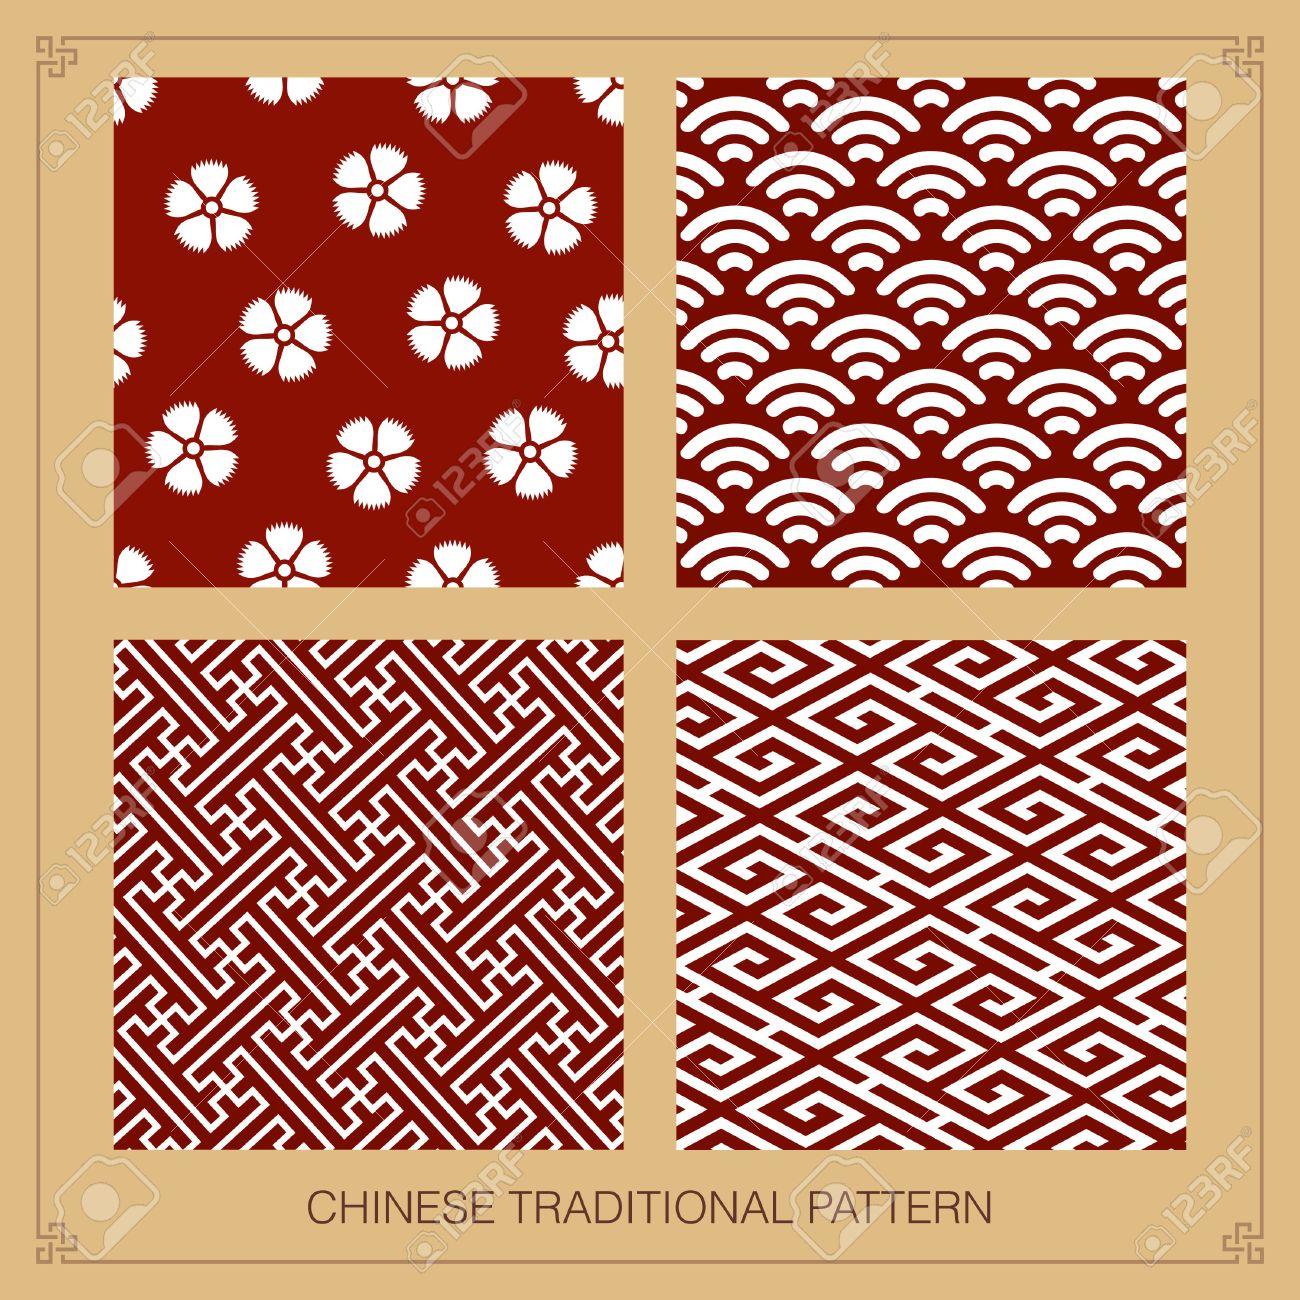 Traditional China Patterns 31,783 china pattern stock illustrations, cliparts and royalty